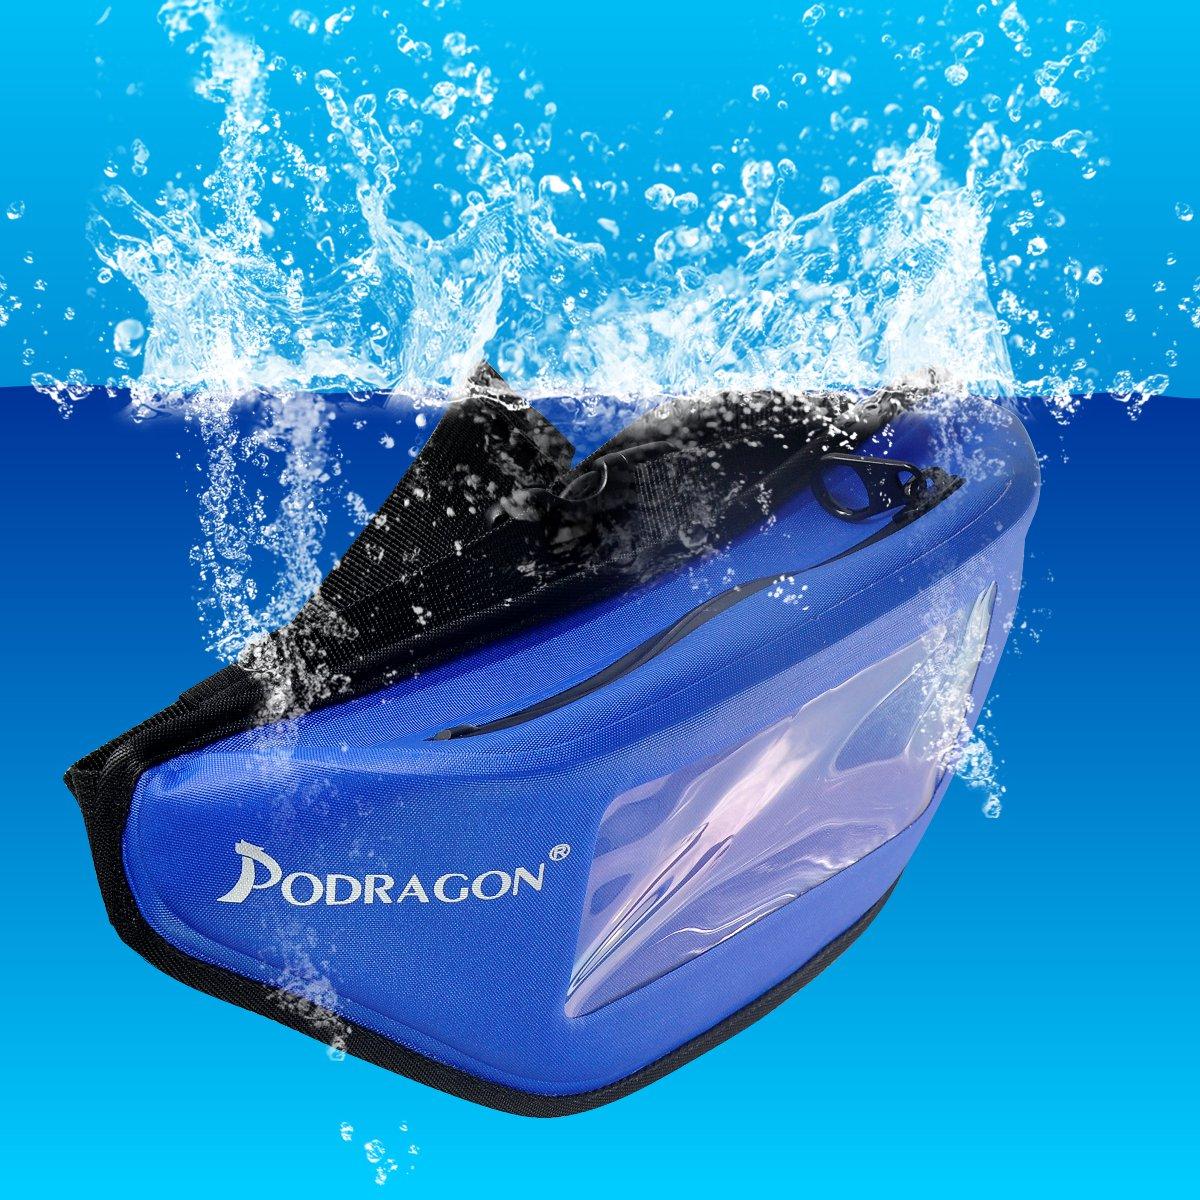 Podragon潜水腰包超级气密拉链大容量户外游泳男女手机防水袋